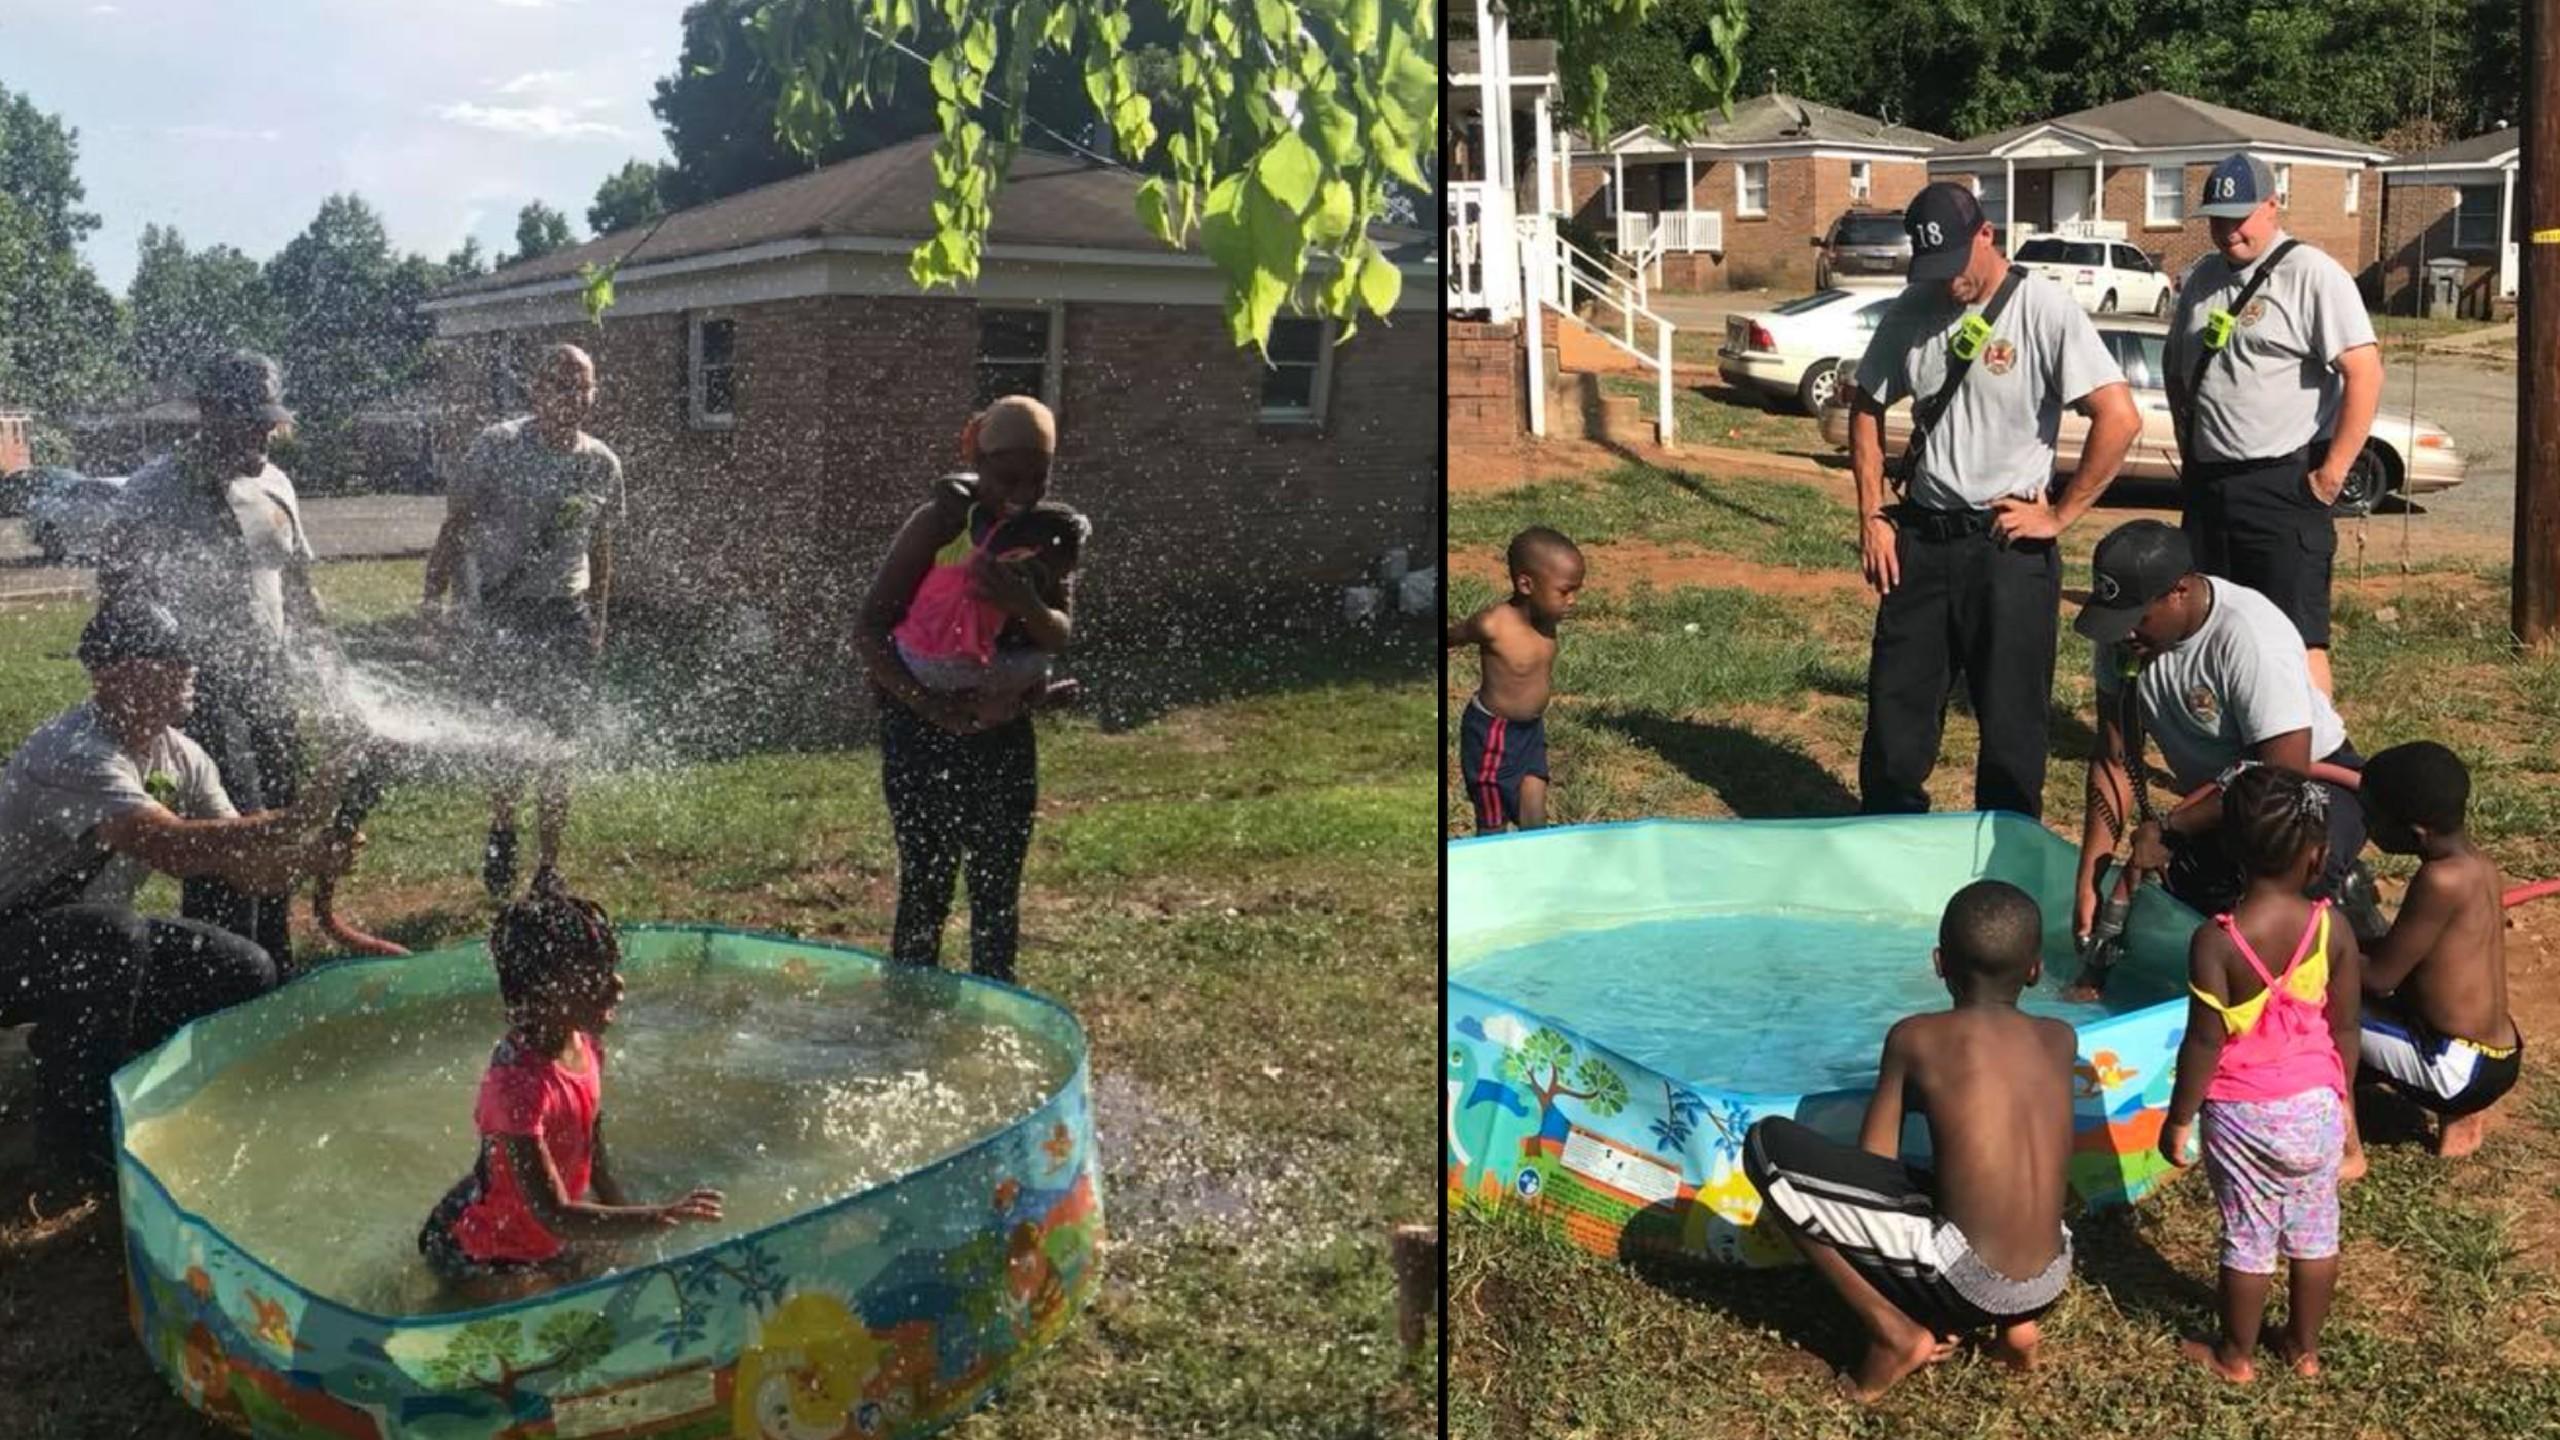 Firefighters stop to help fill kiddie pool